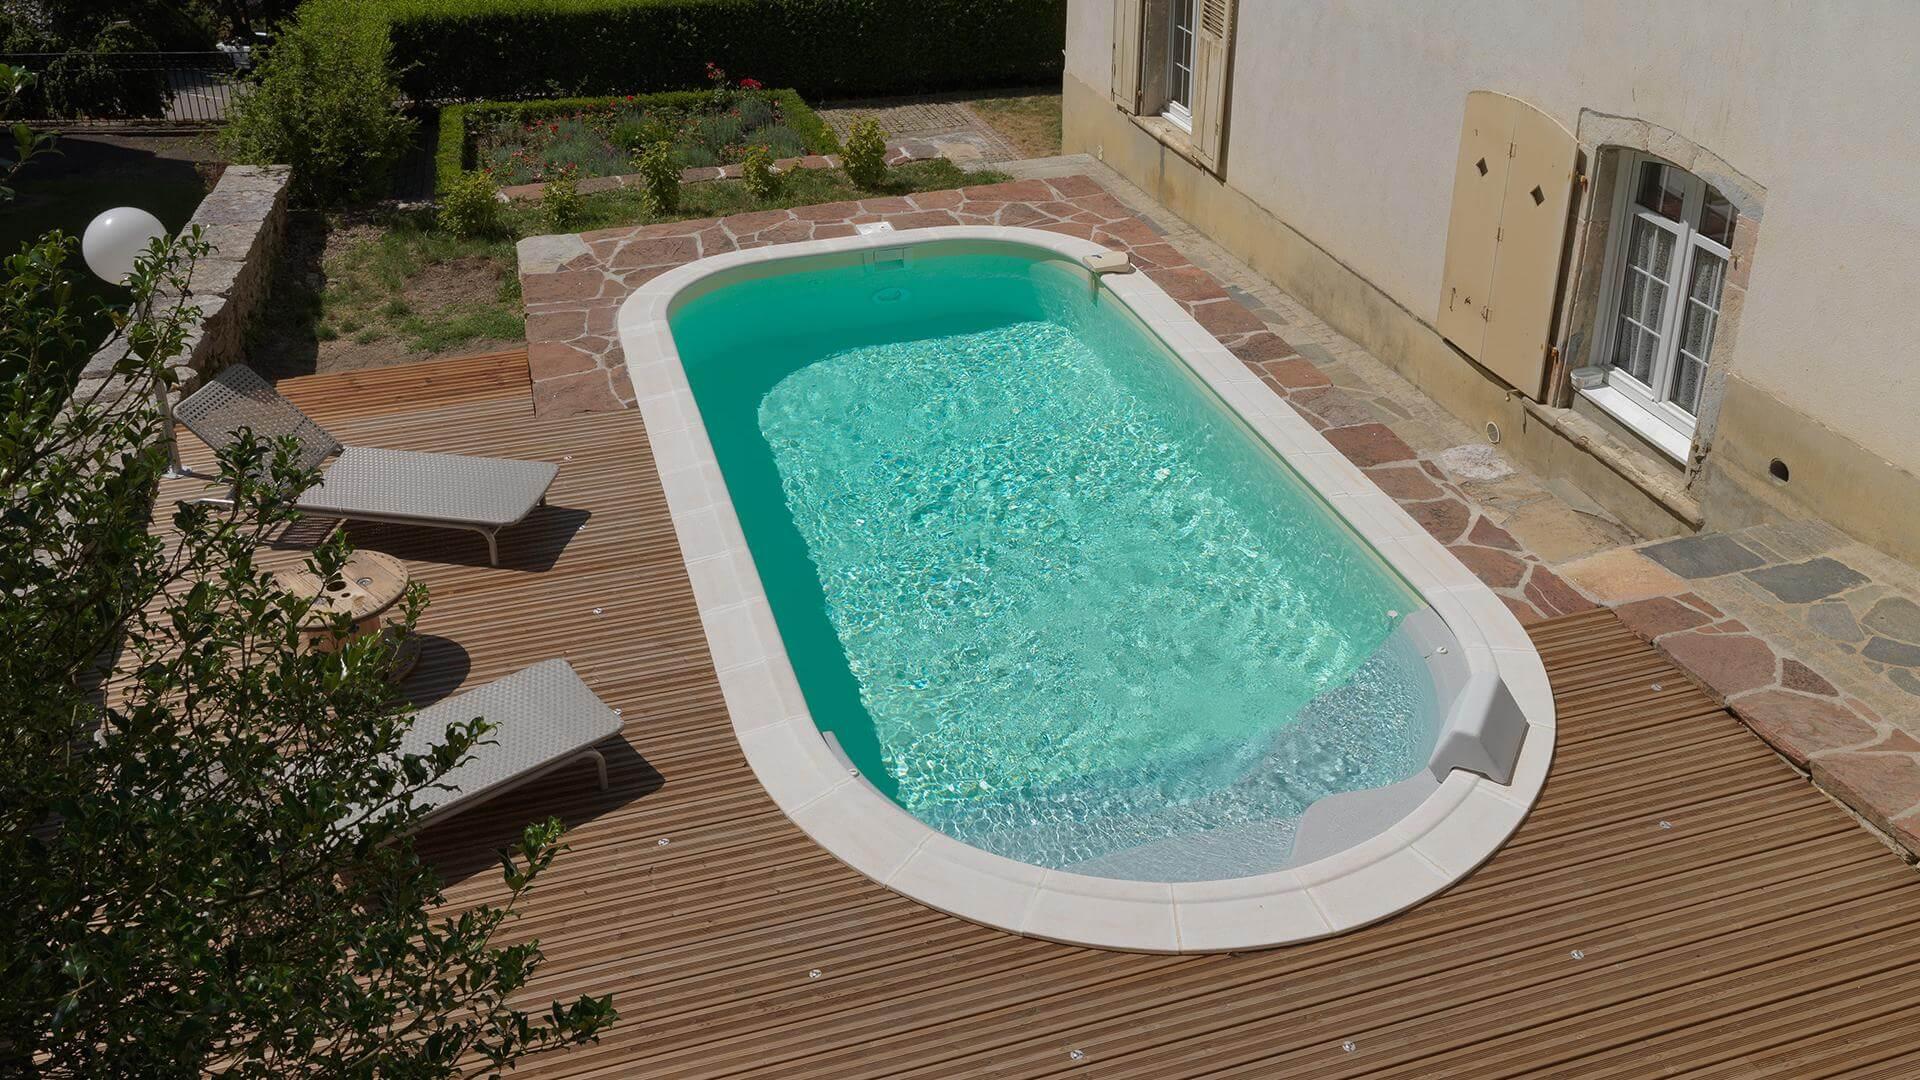 Projet Piscine Saint Andre De Cubzac piscine rectangle luna | piscines waterair